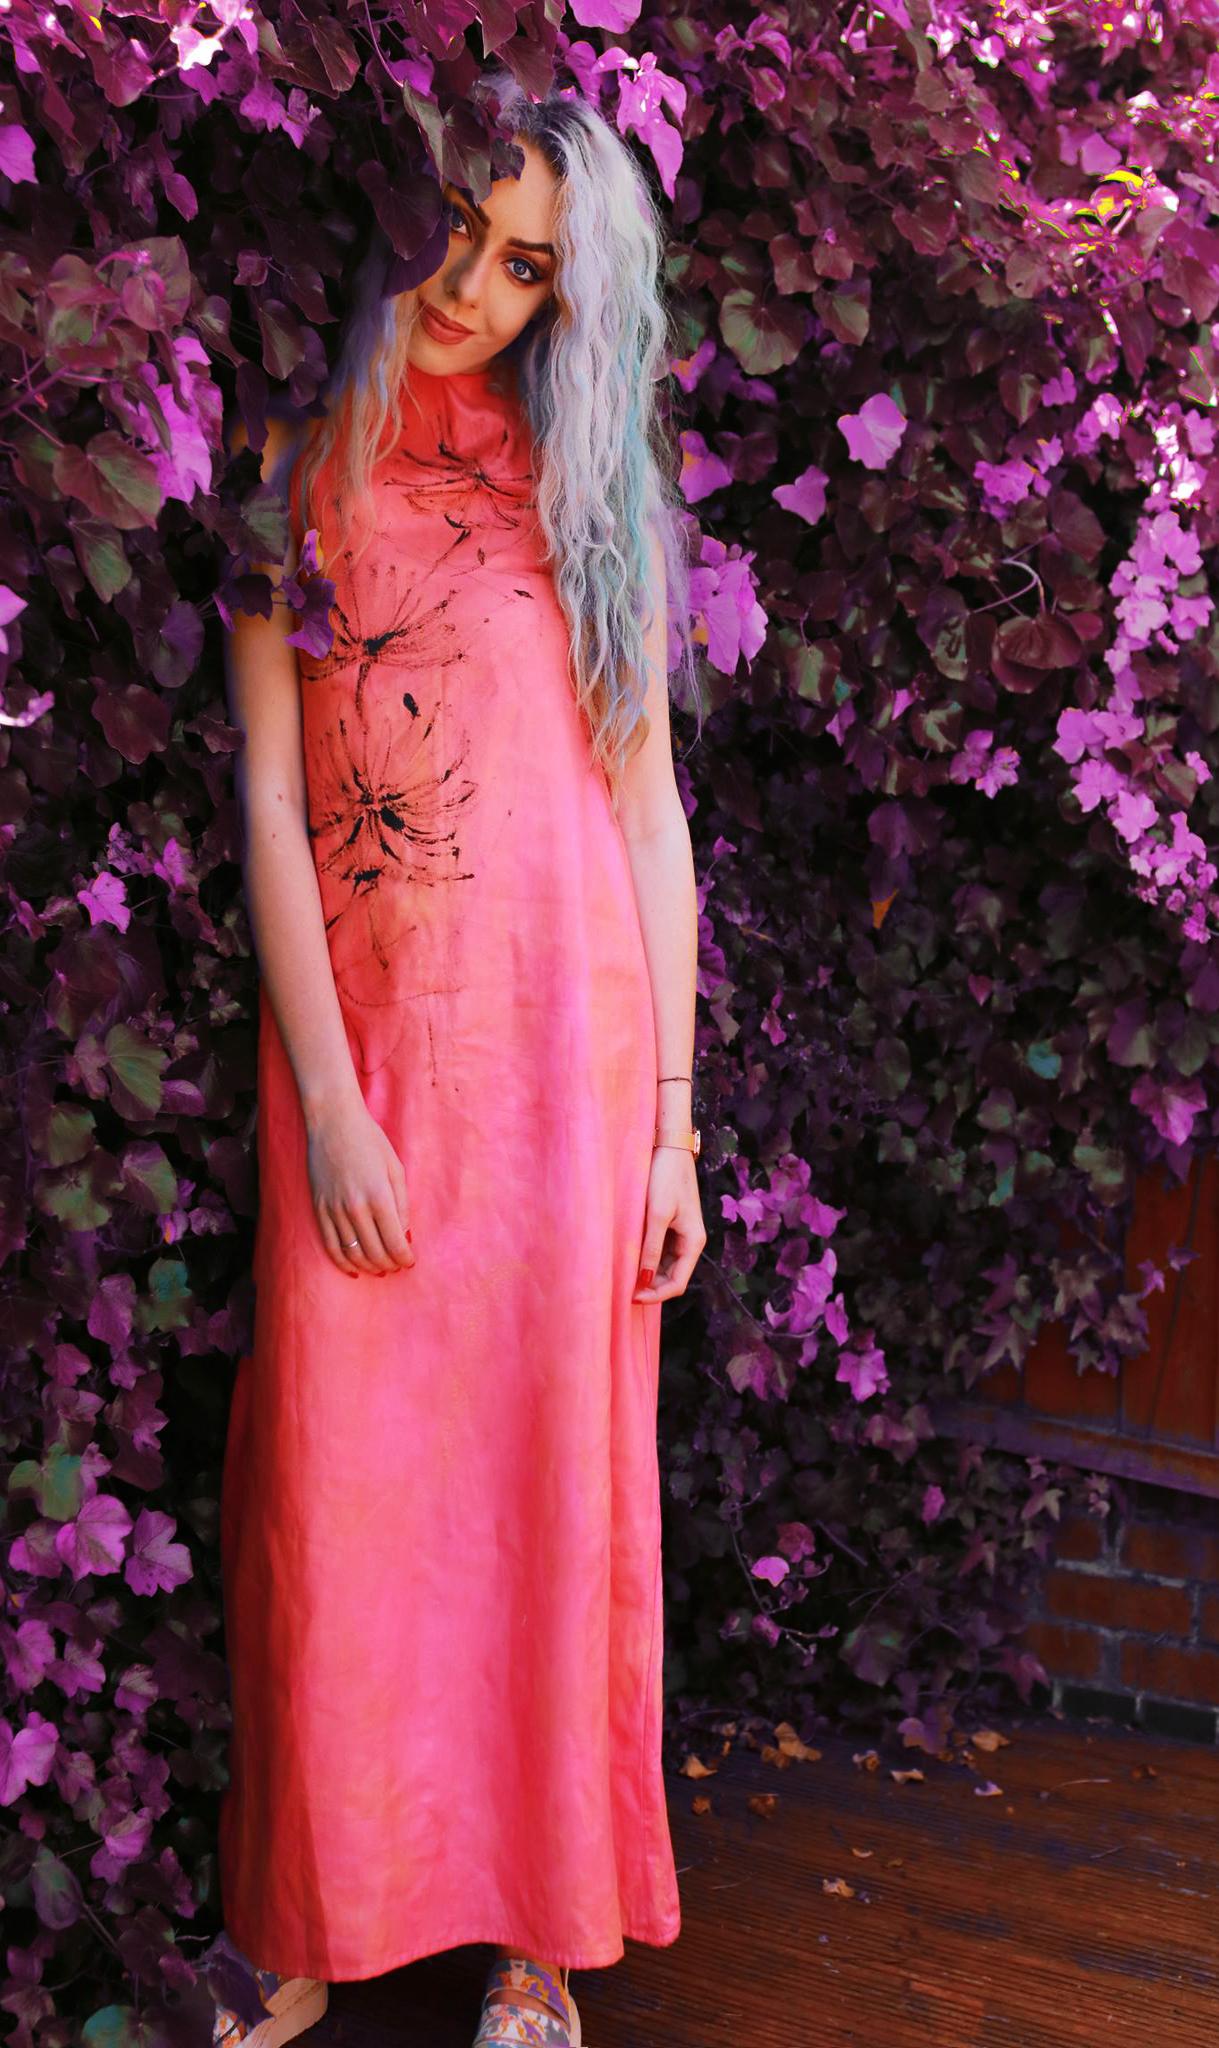 Liverpool Fashion Blogger Stephi LaReine wears Kennedy Design